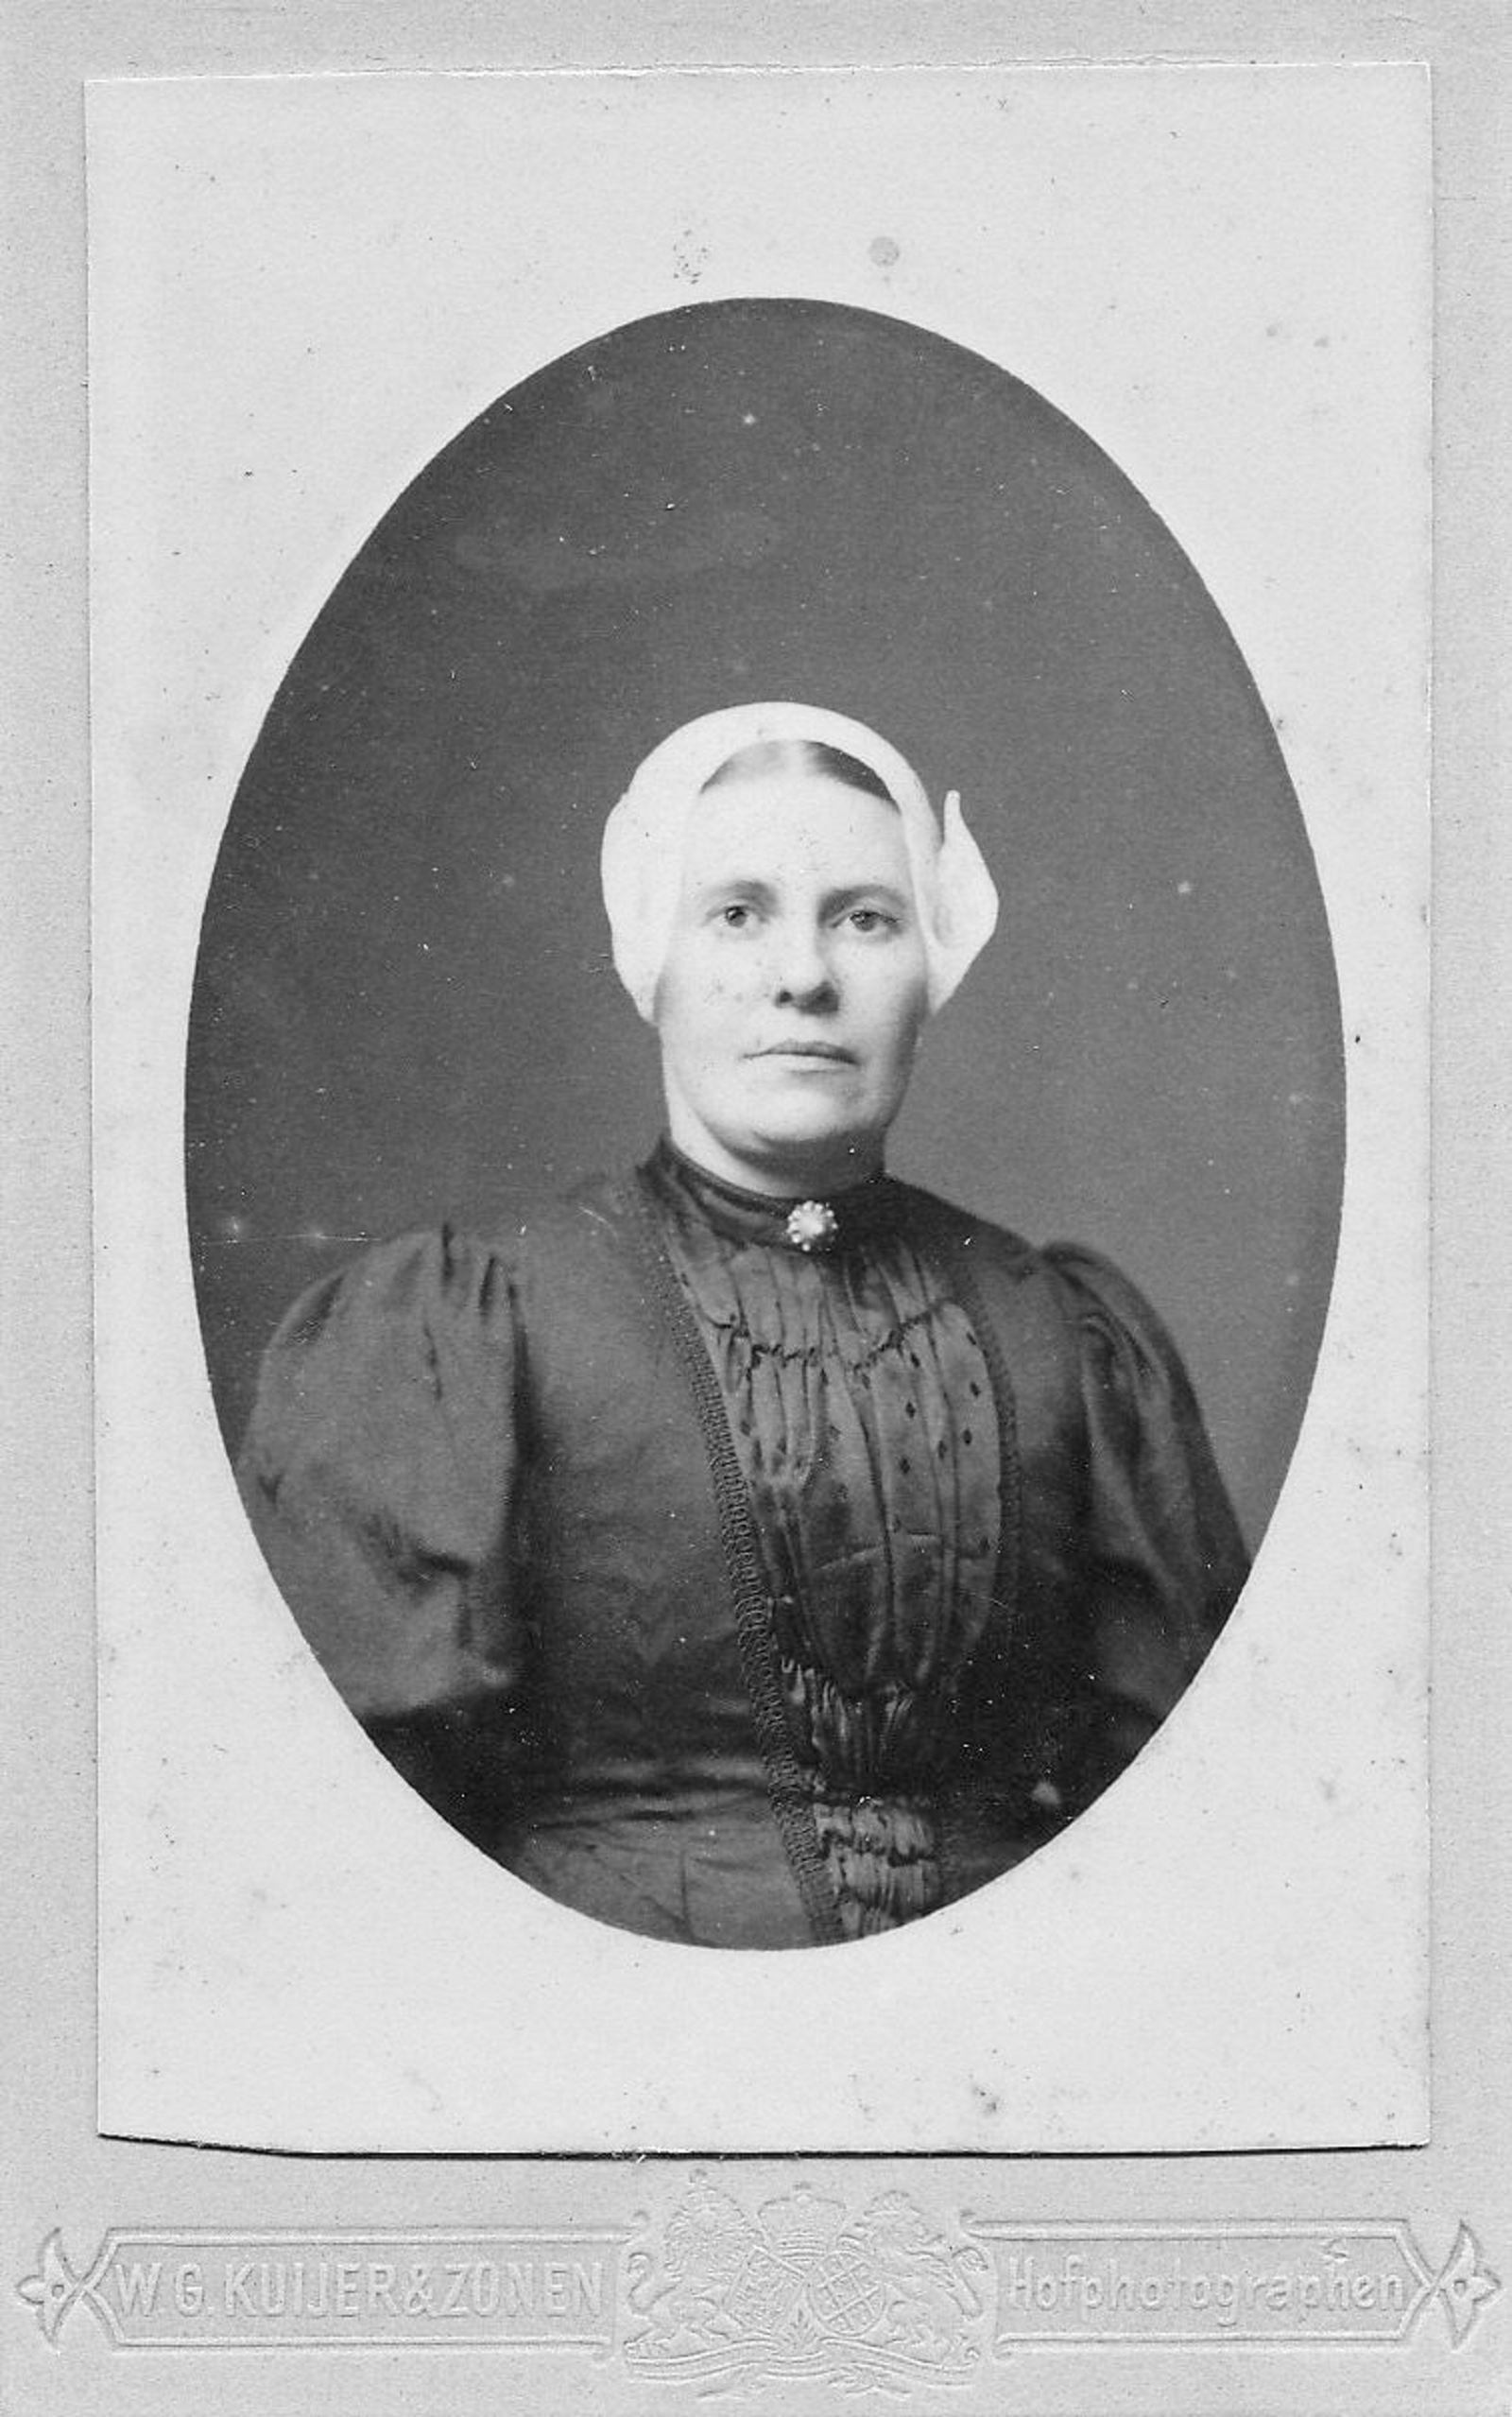 Bos Arie 1857 19__ Portret 2e vrouw Willemijntje Vrijenhoek